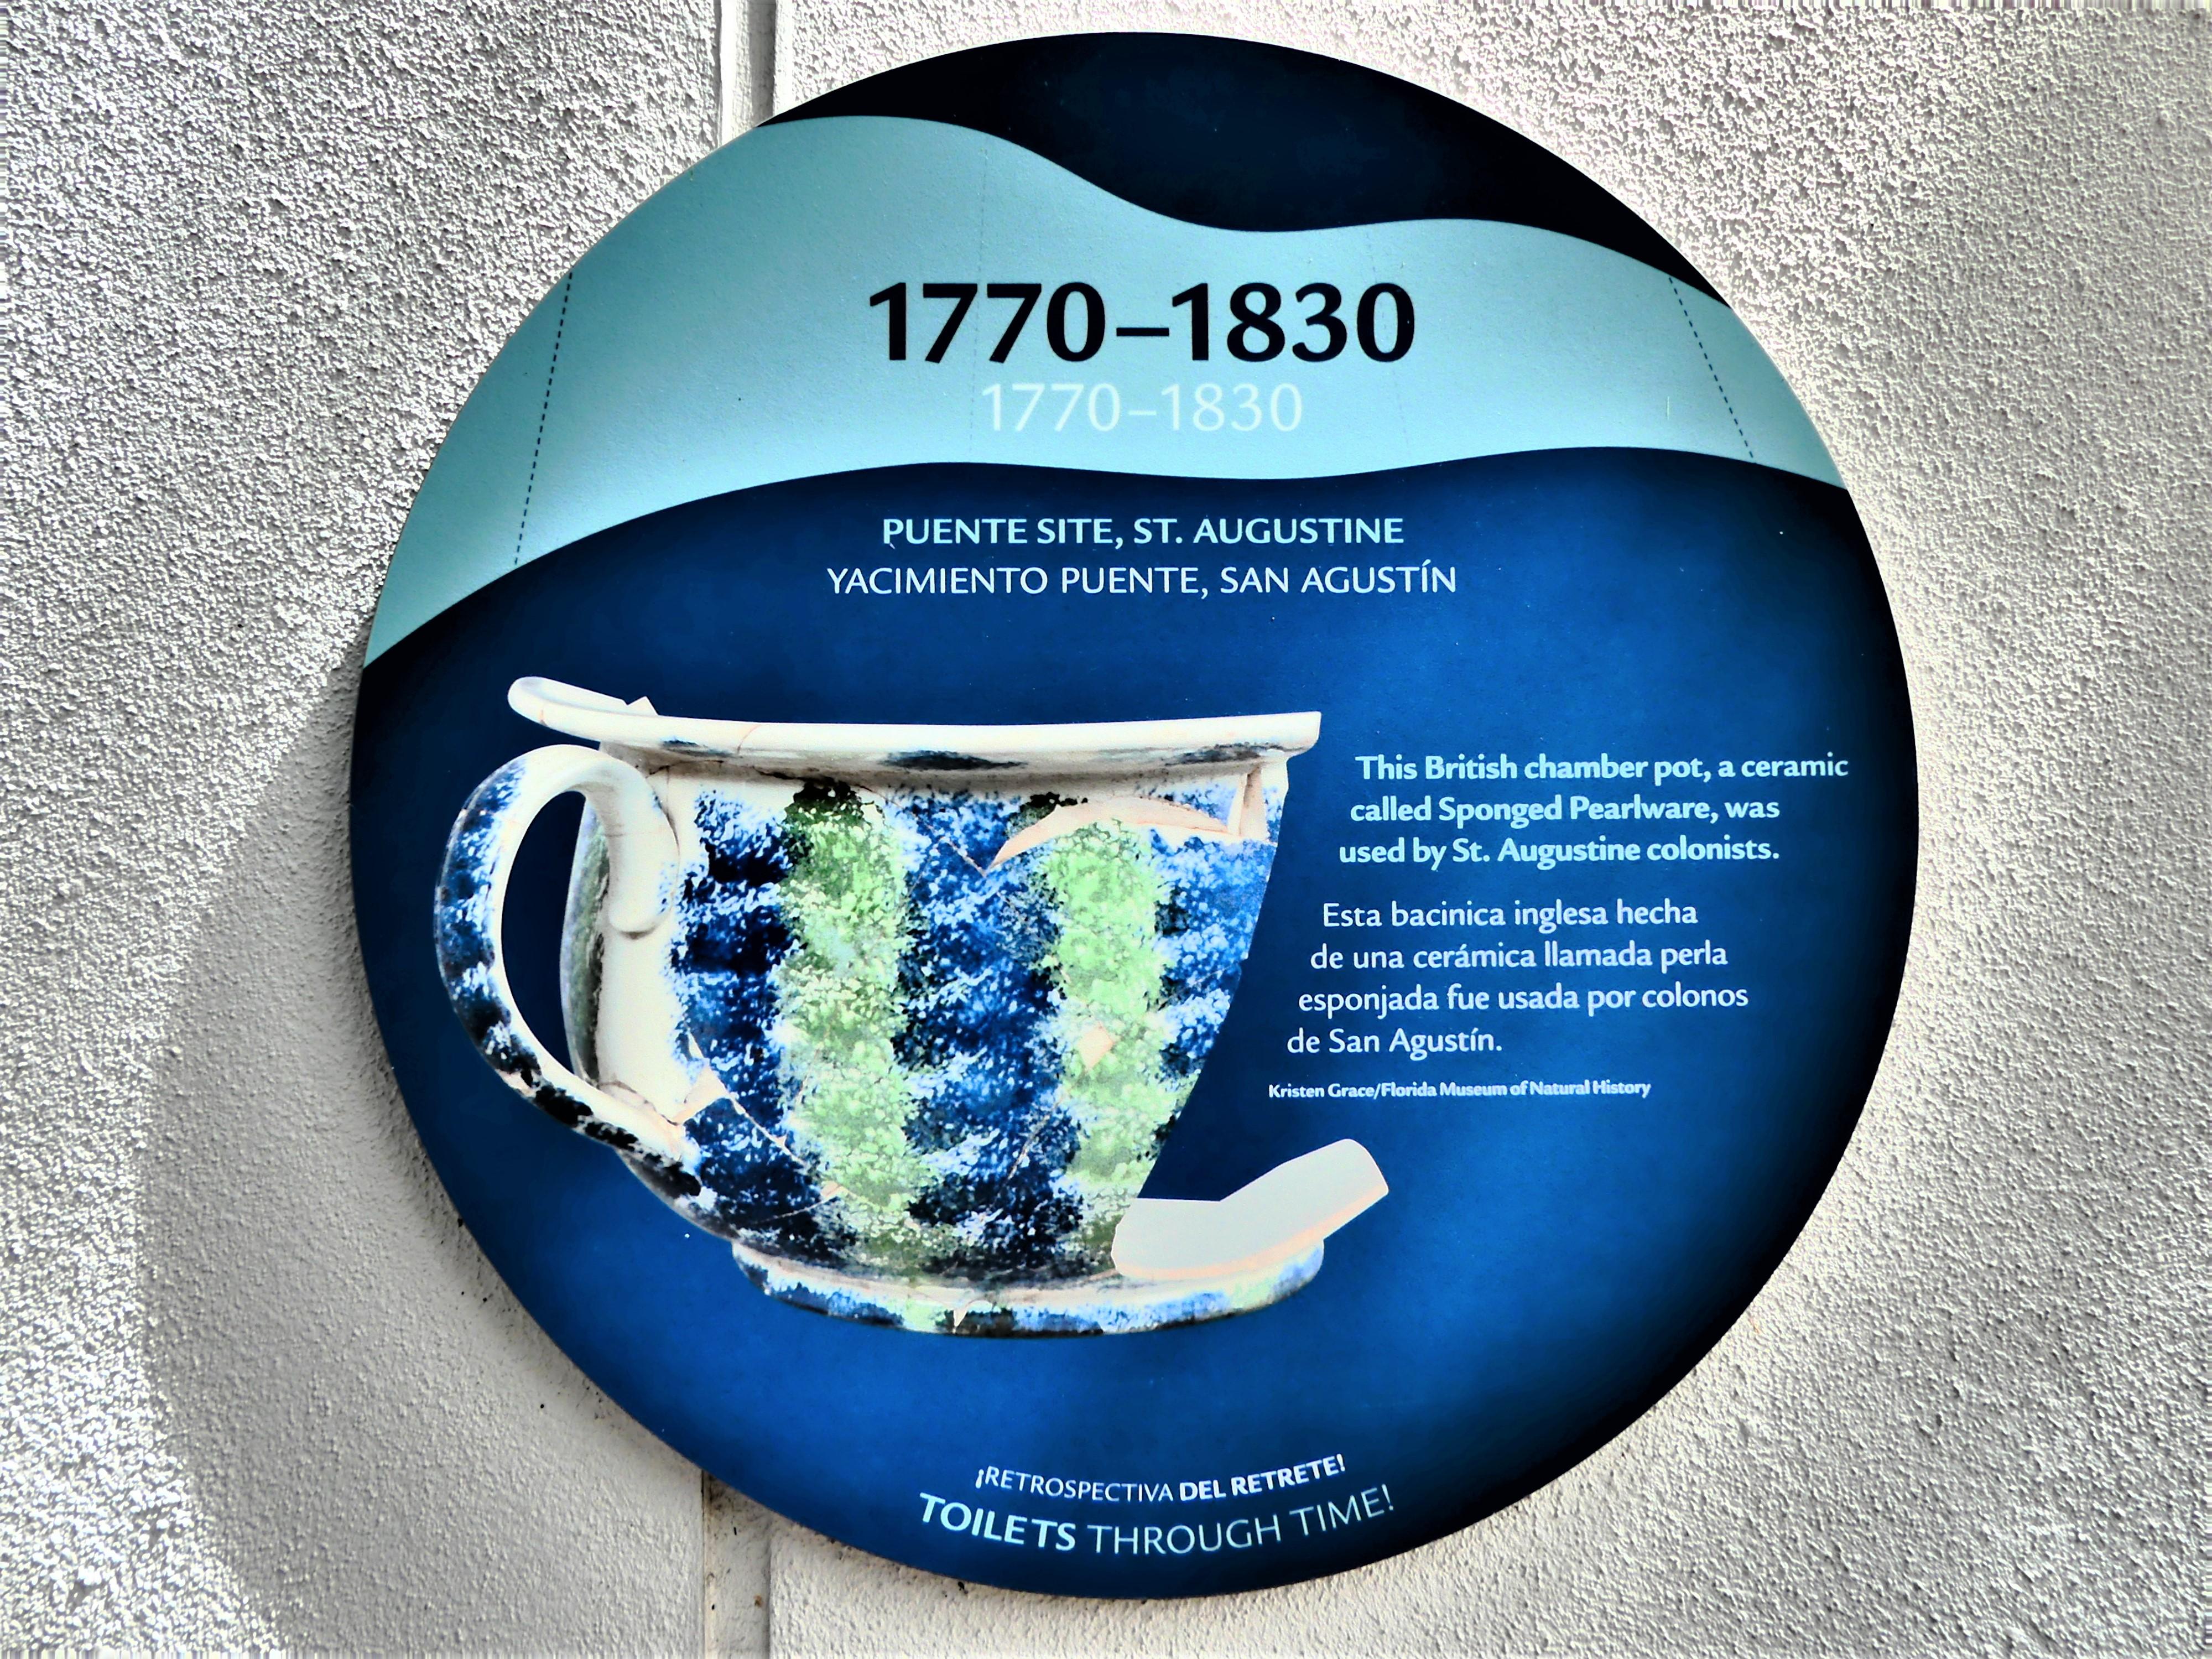 1770-1830